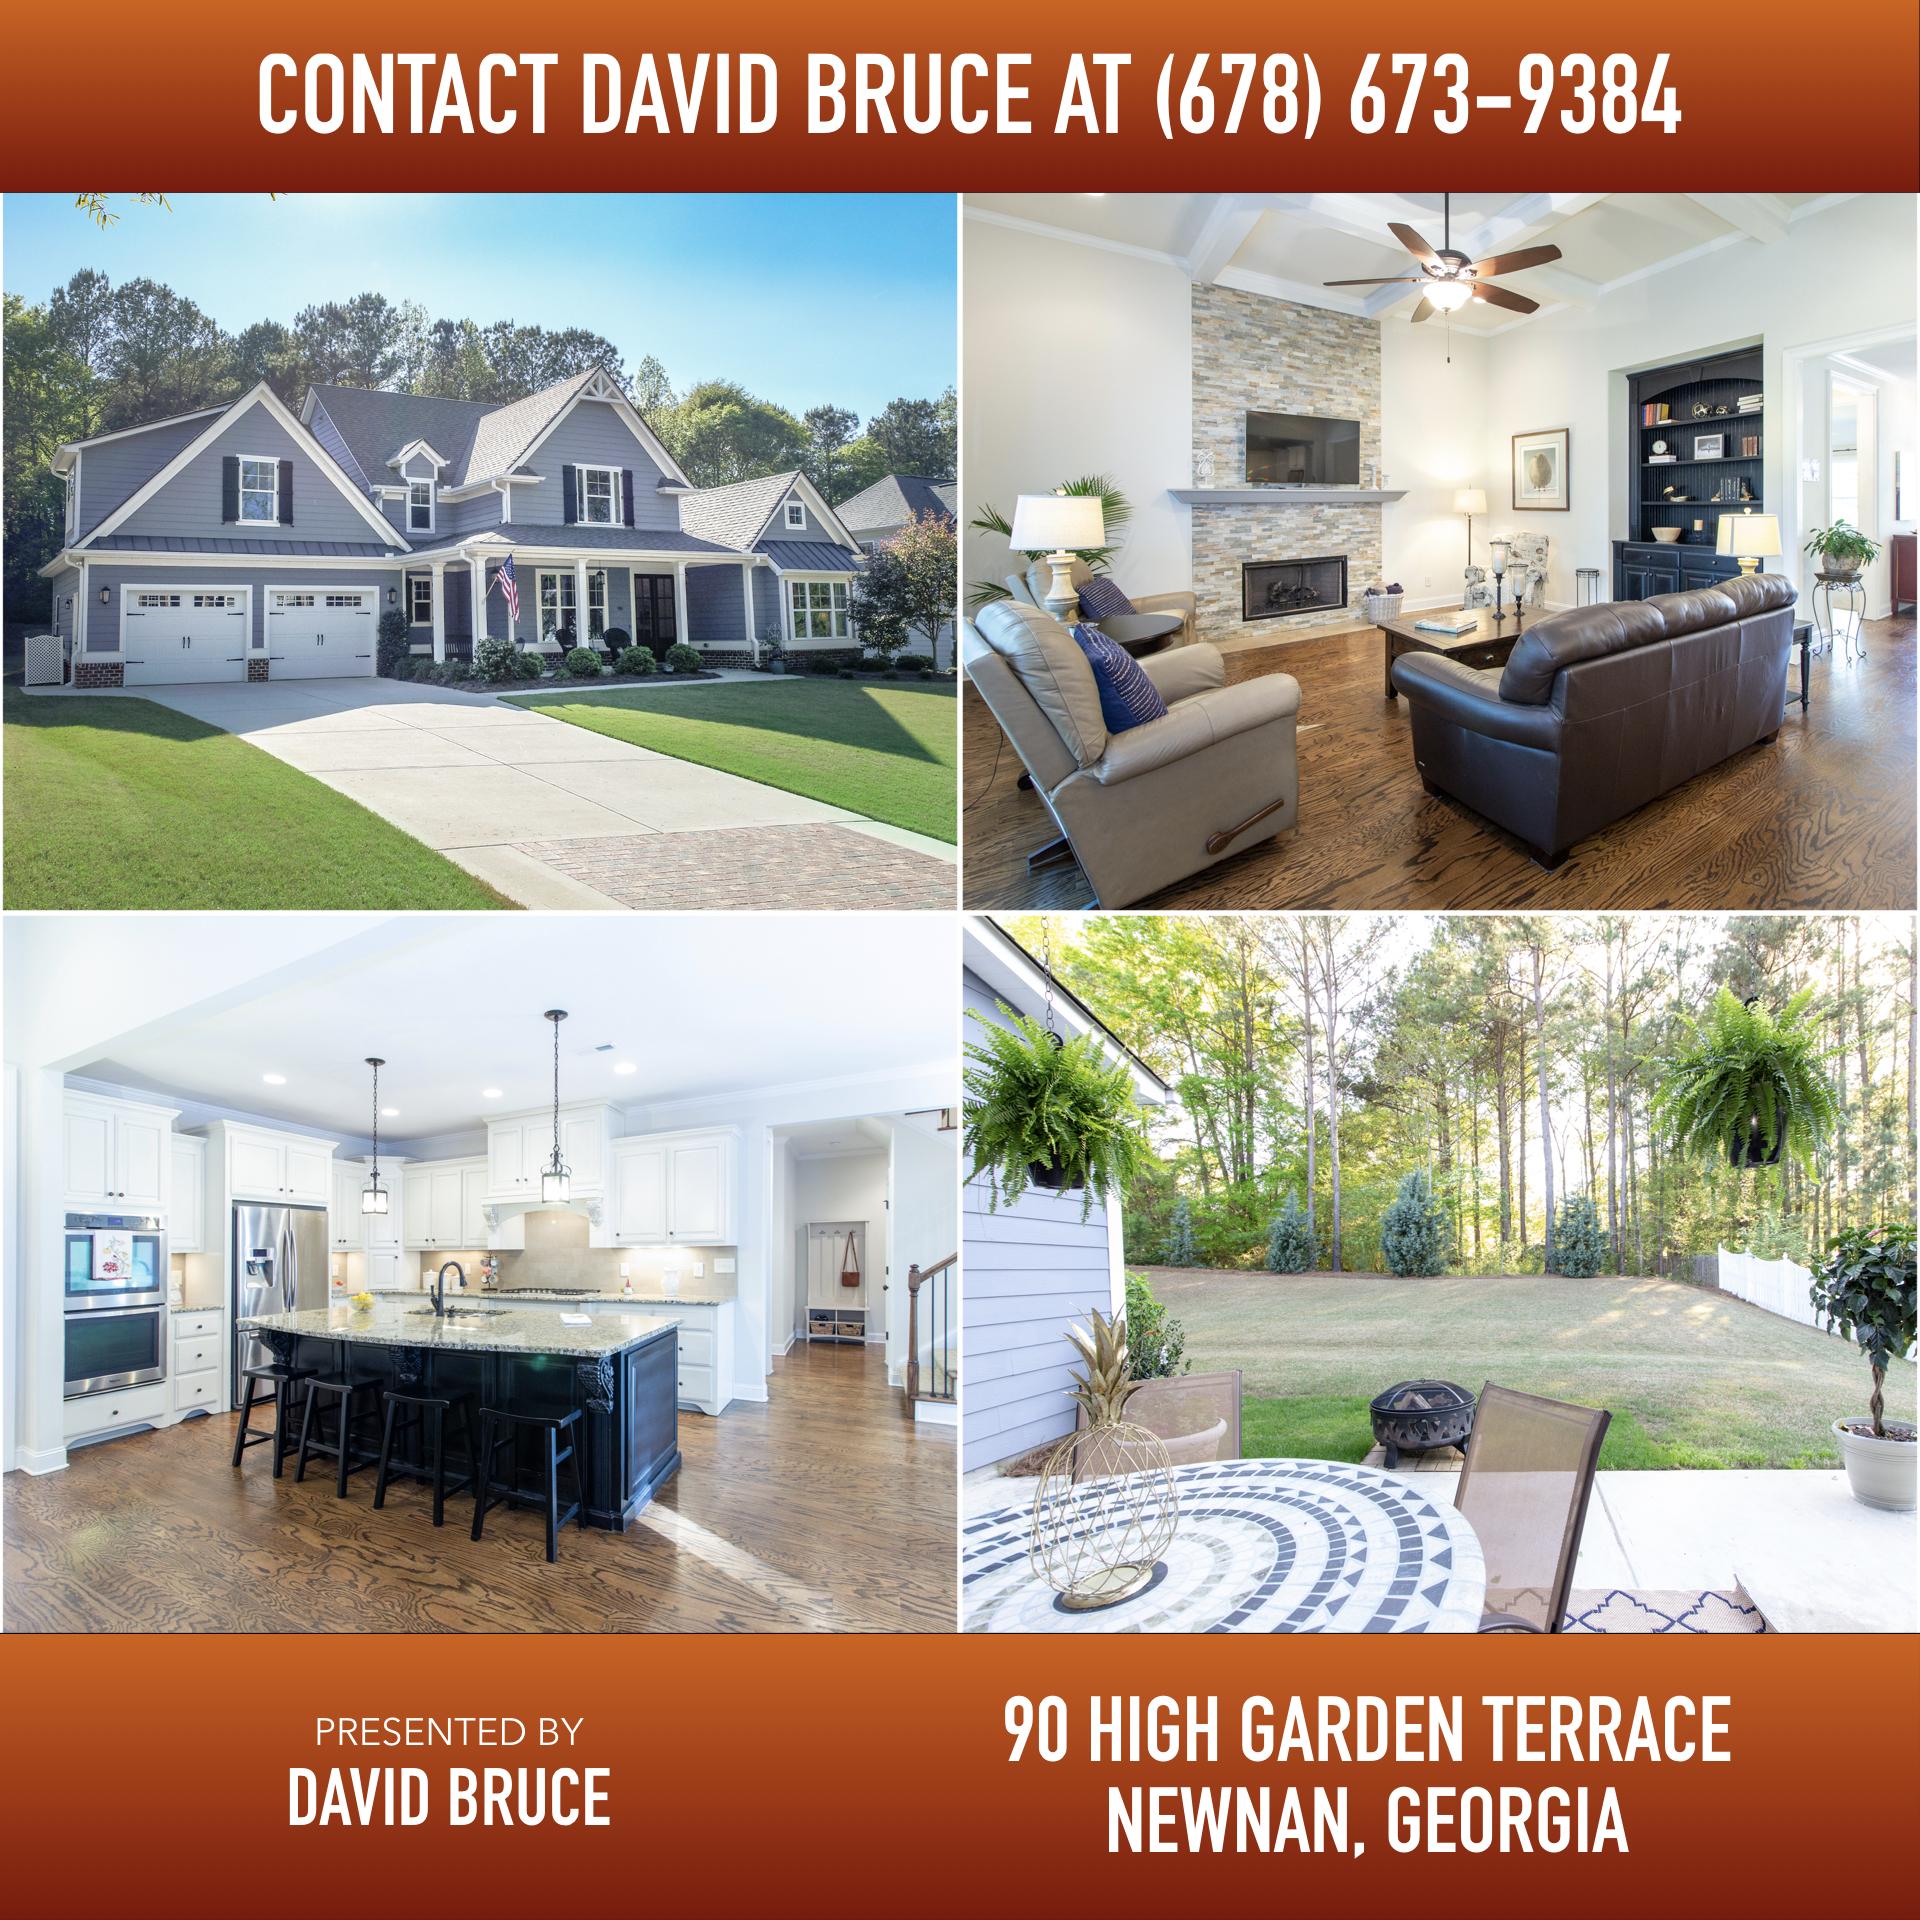 90 High Garden Terrace - Branded Photos.jpg